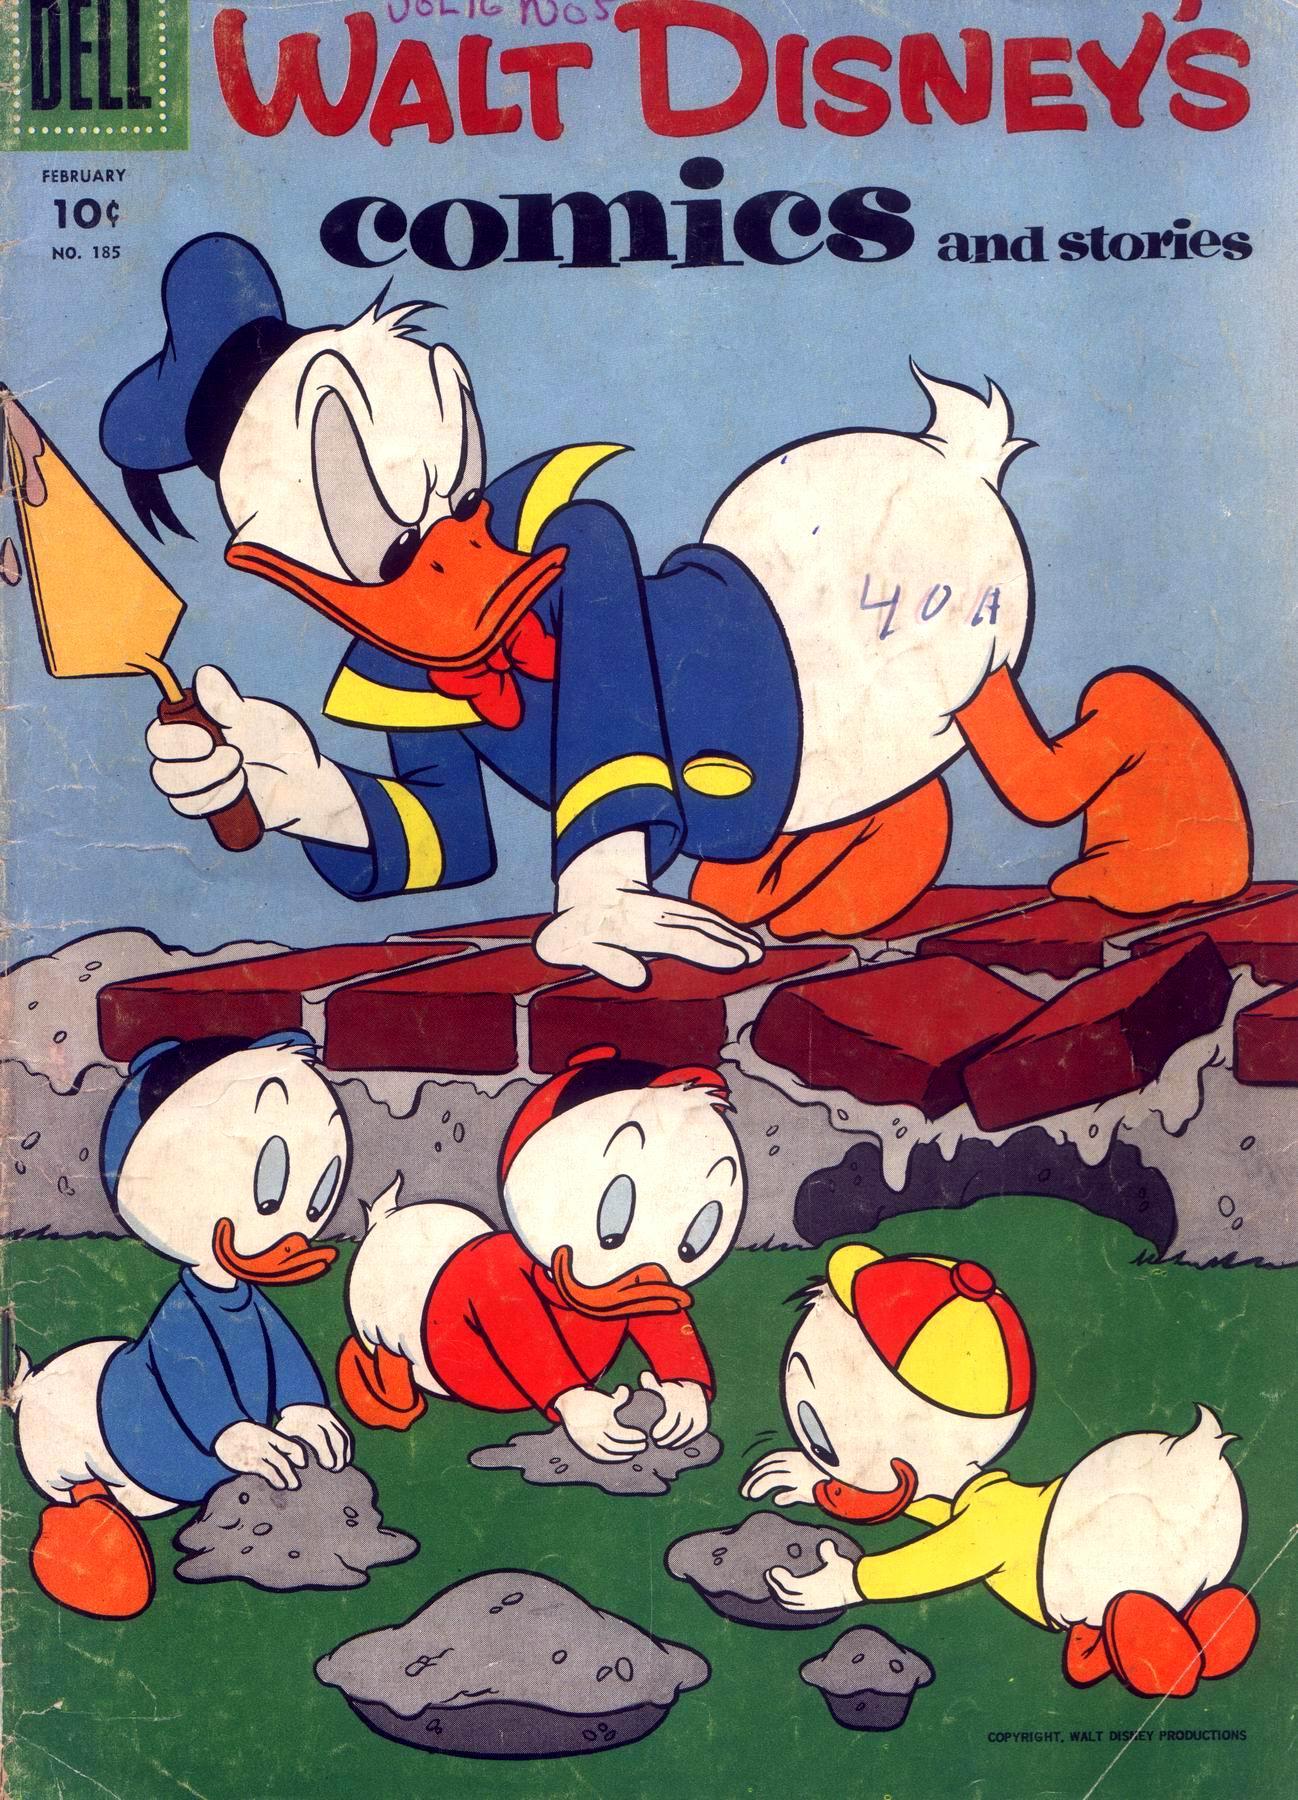 Walt Disneys Comics and Stories 185 Page 1